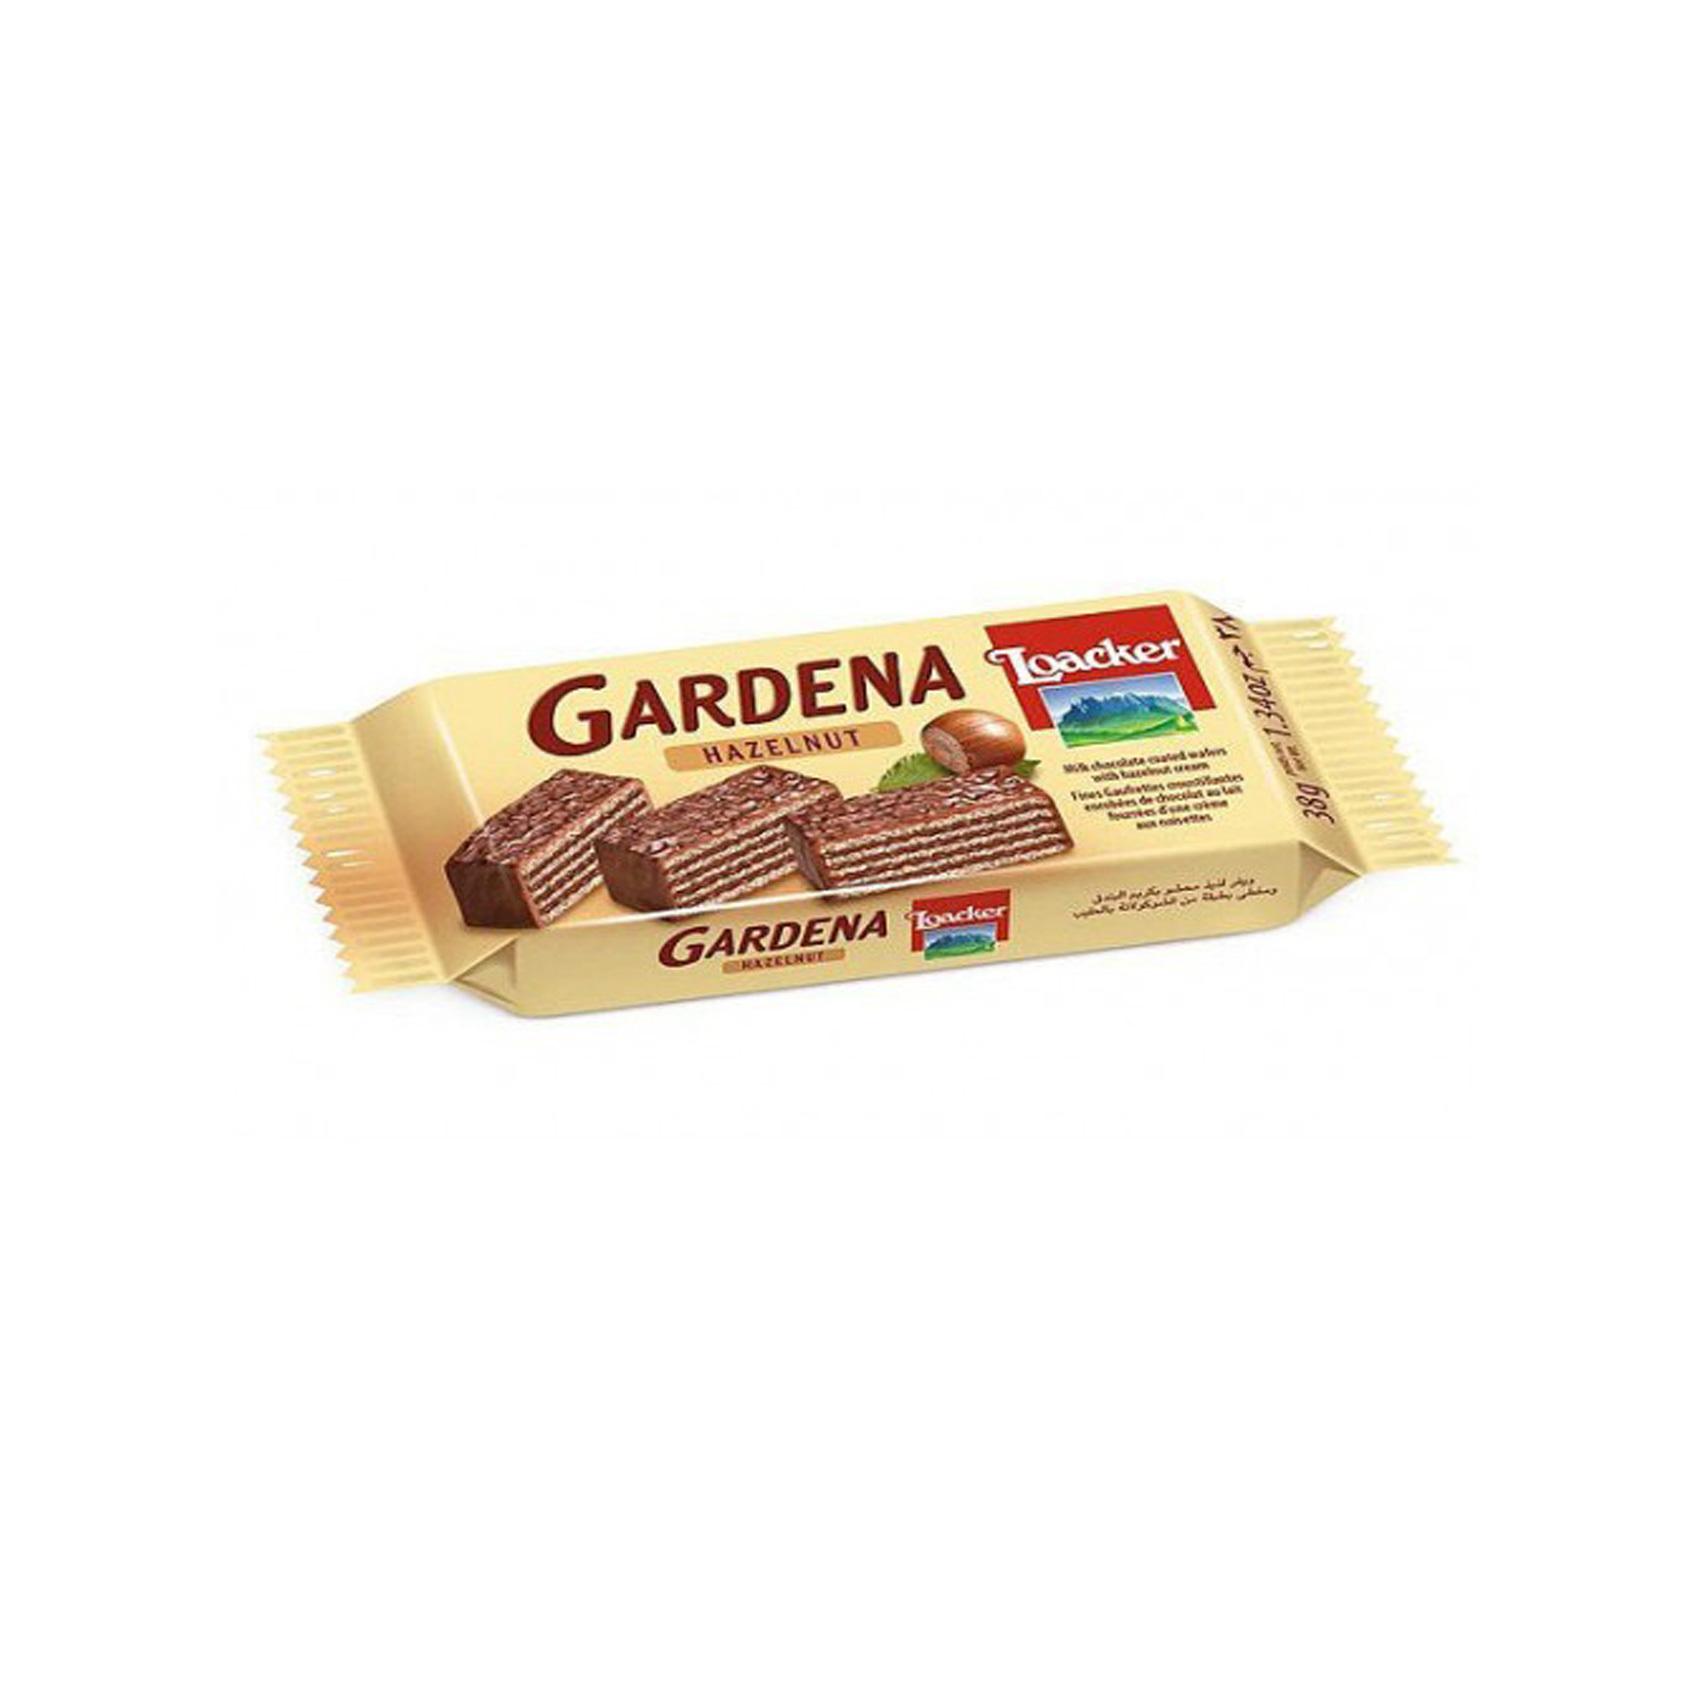 LOACKER GARDENA HAZELNUT 38GR